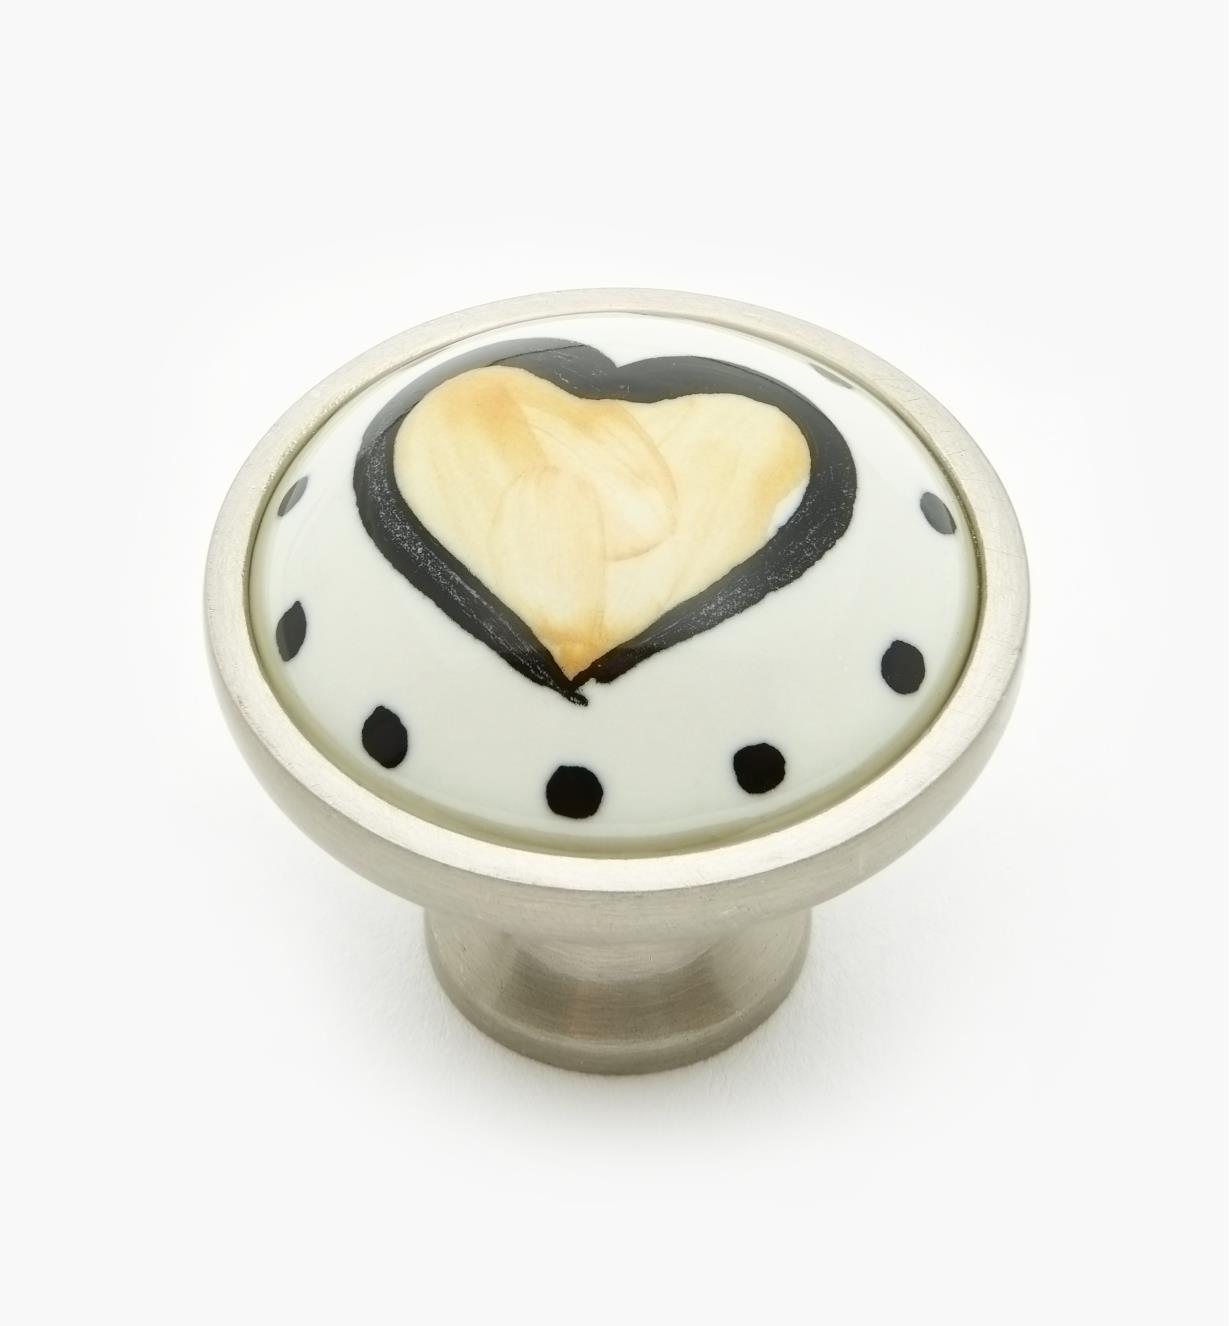 "99W9602 - 34mm (1 5/16"") Yellow Heart Knob, each"